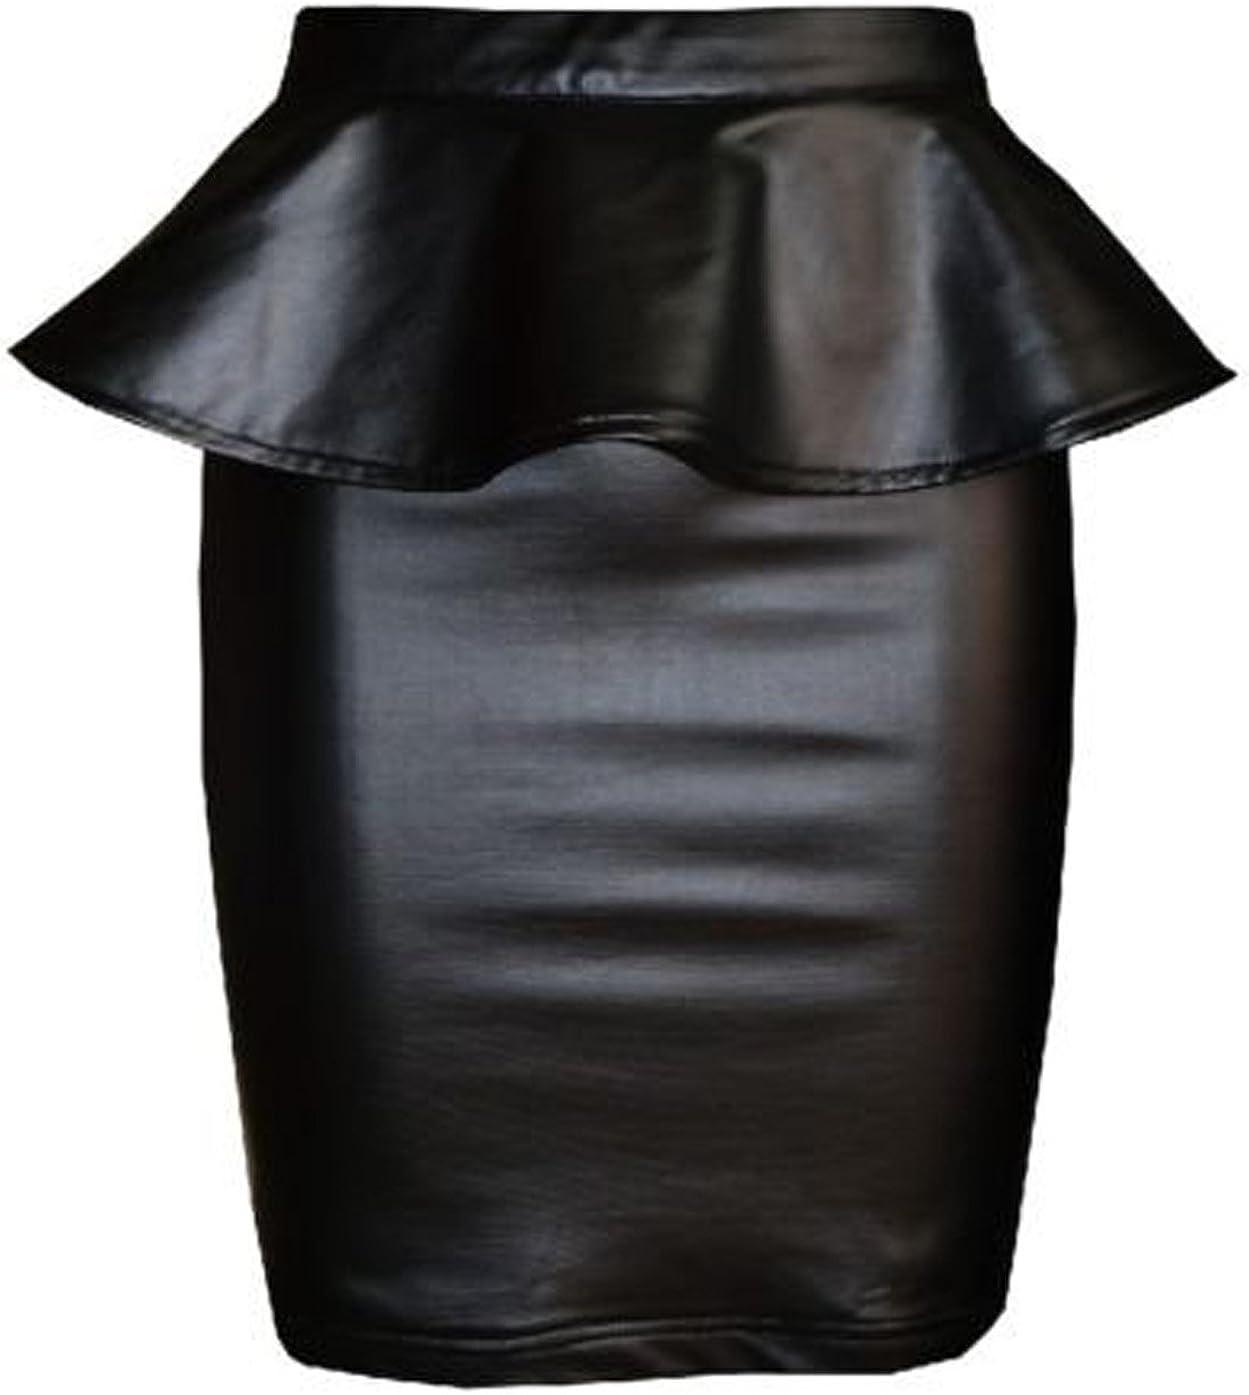 FashionMark Womens Plus Size Wet Look Peplum Pencil Skirt Ladies Celebrity PVC Leather Skirt - Black - Sizes 6-20